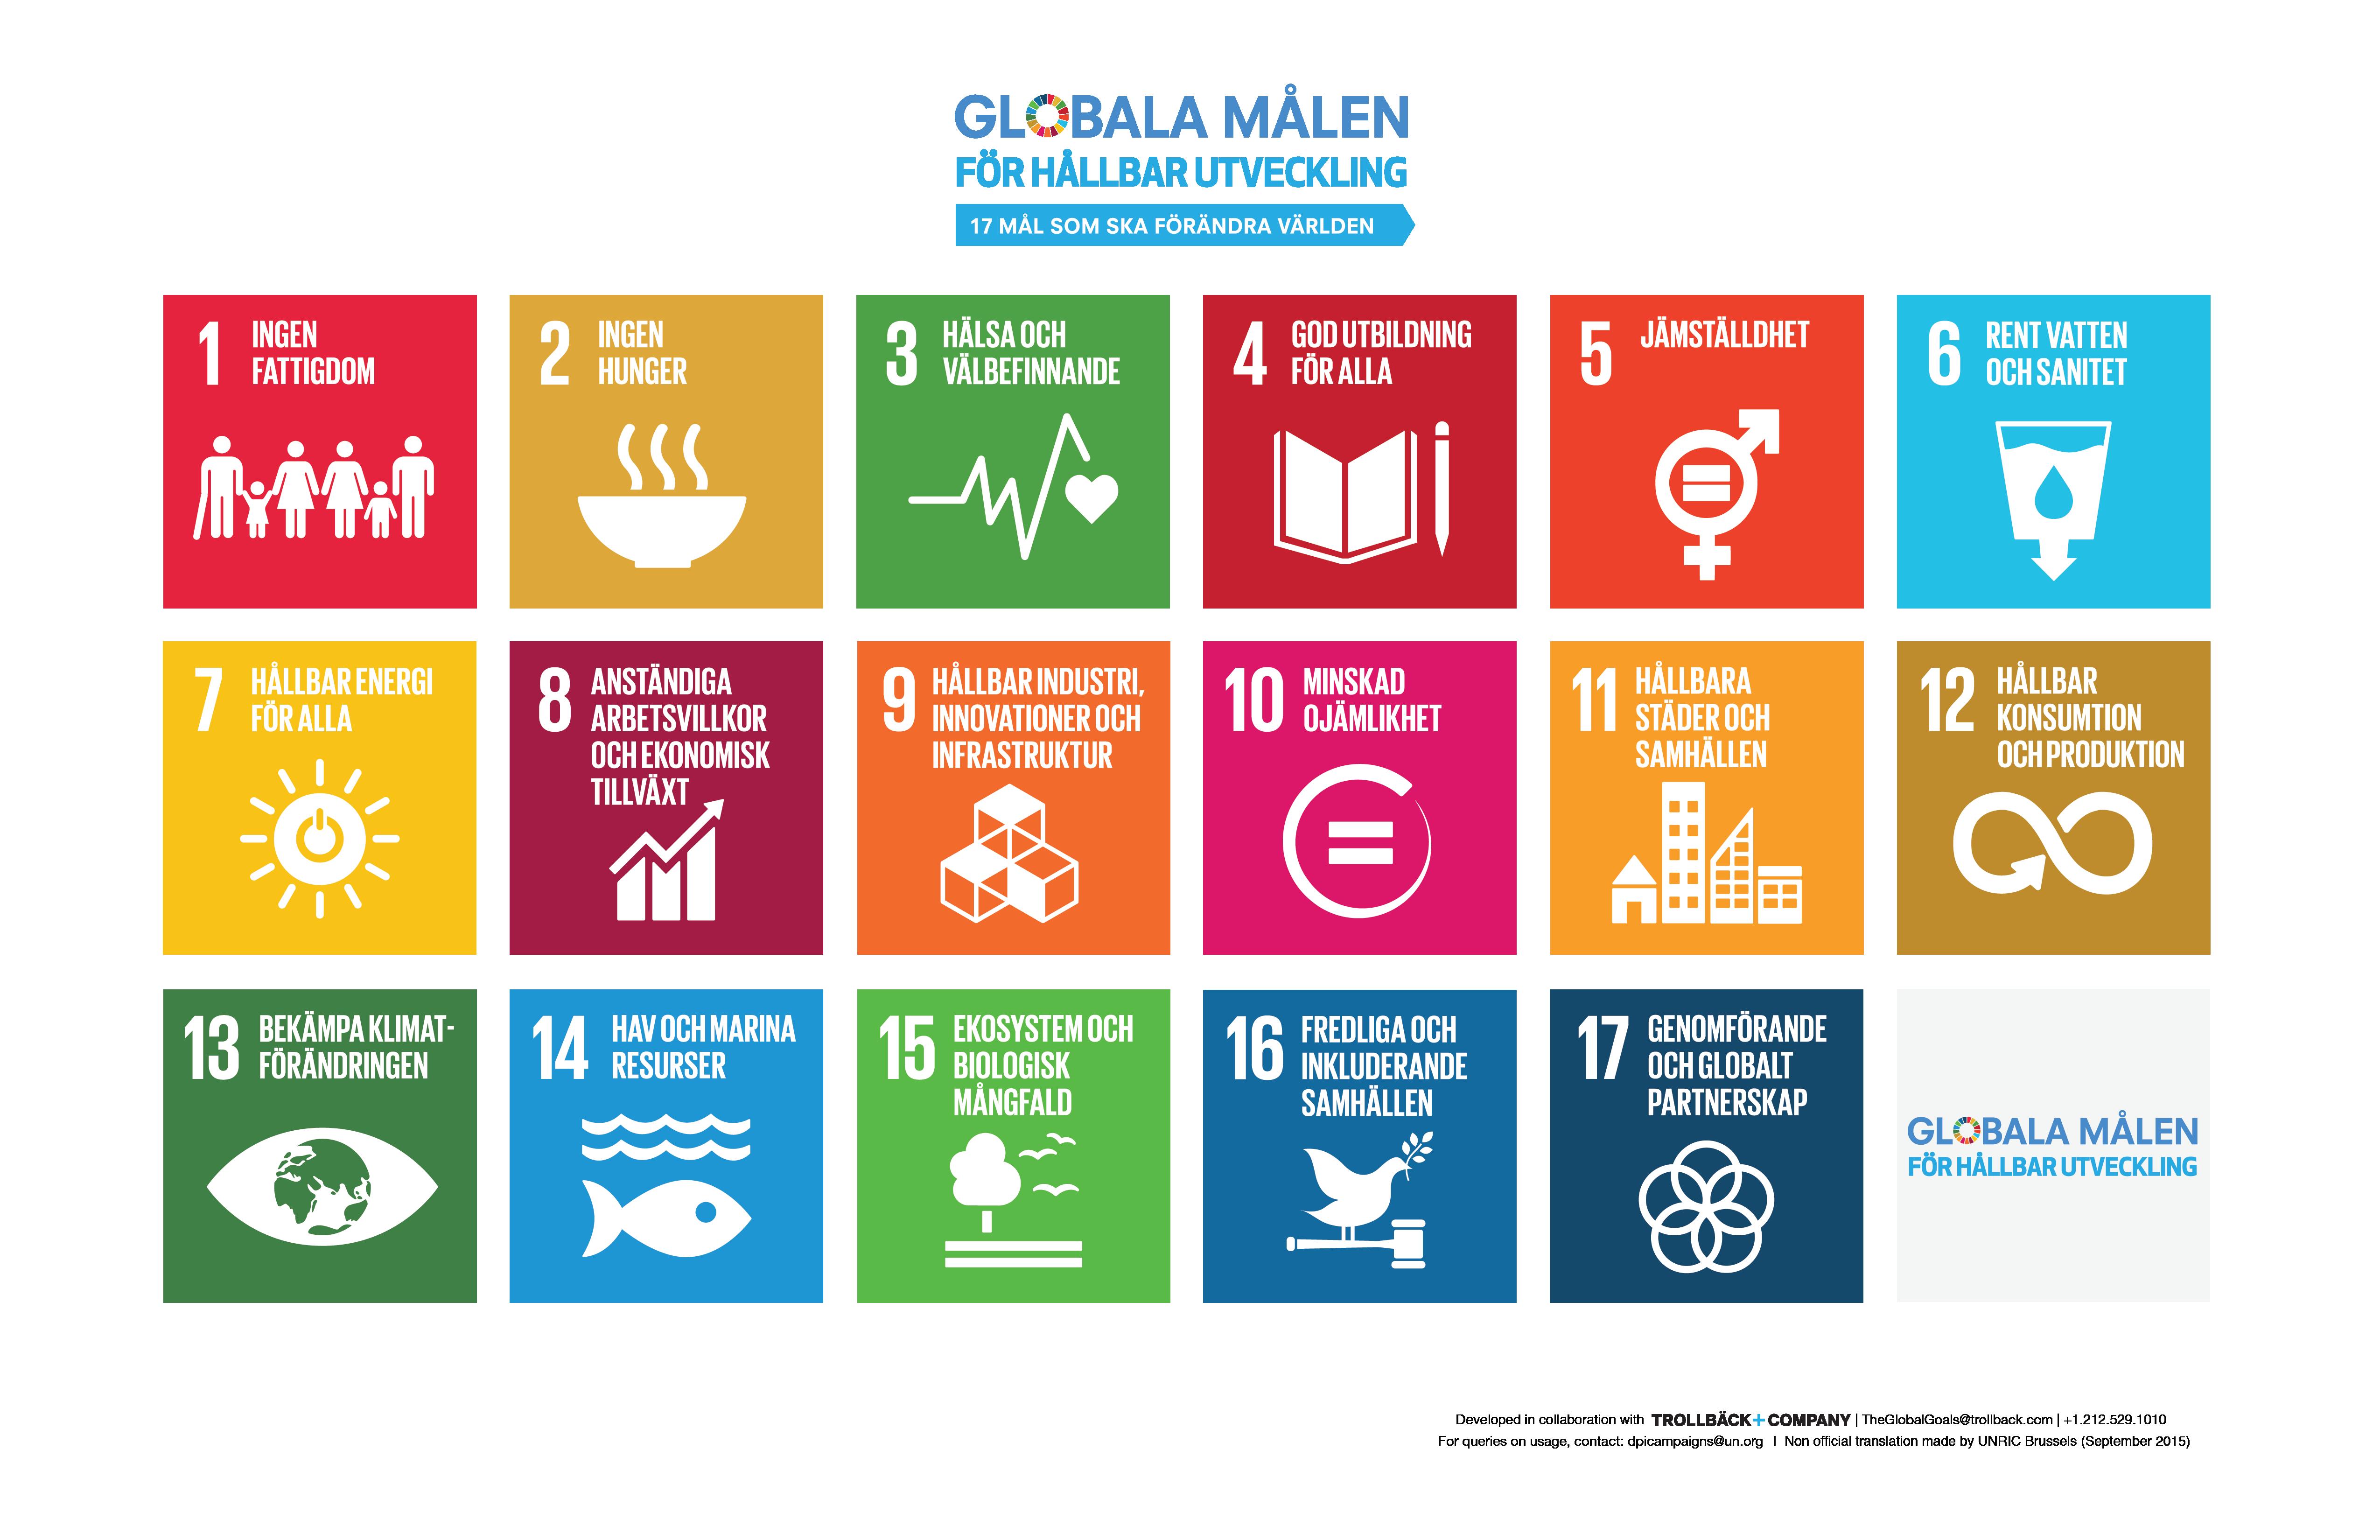 Bild över de globala målen